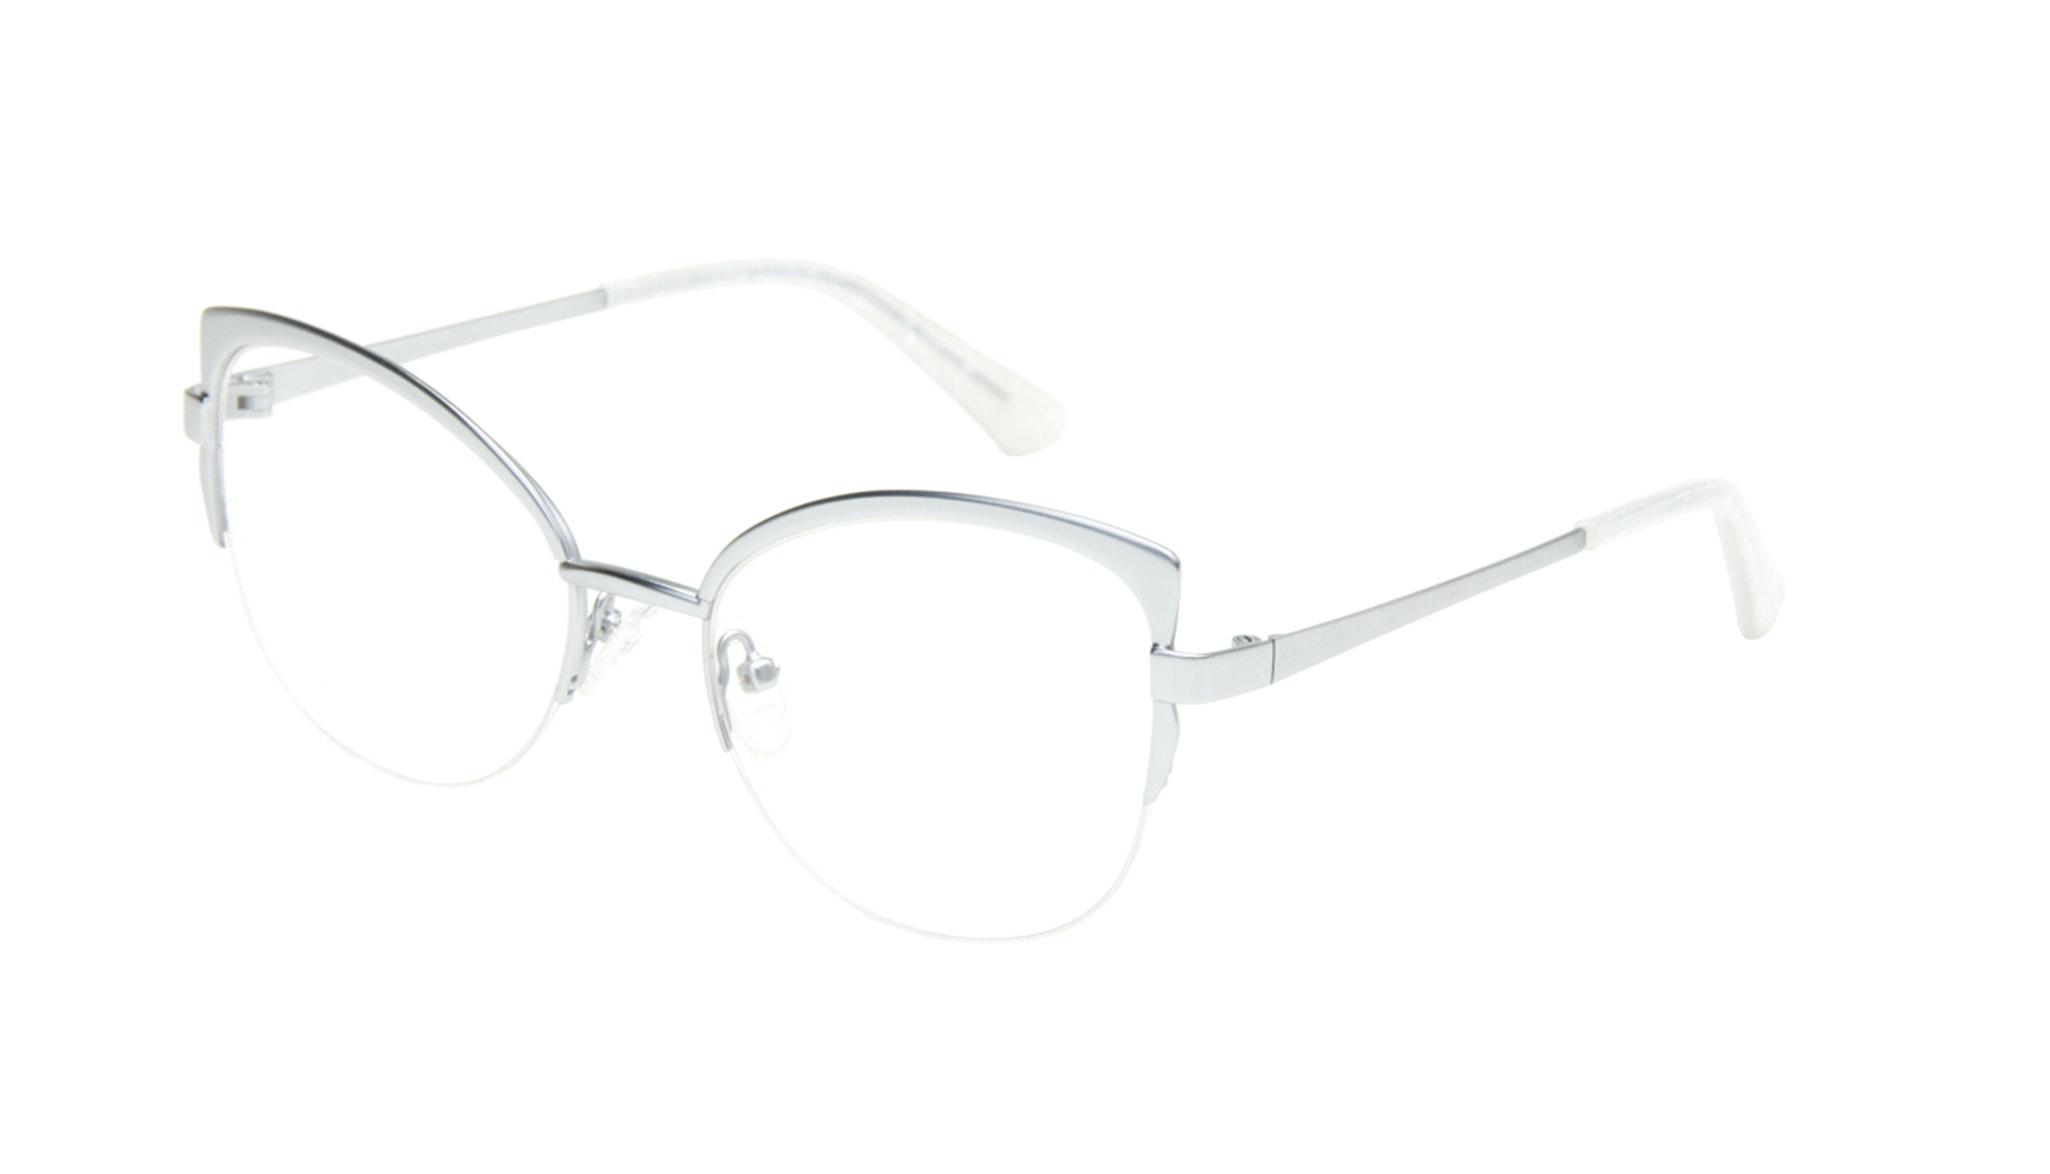 Affordable Fashion Glasses Cat Eye Eyeglasses Women Adore Silver Marble Tilt